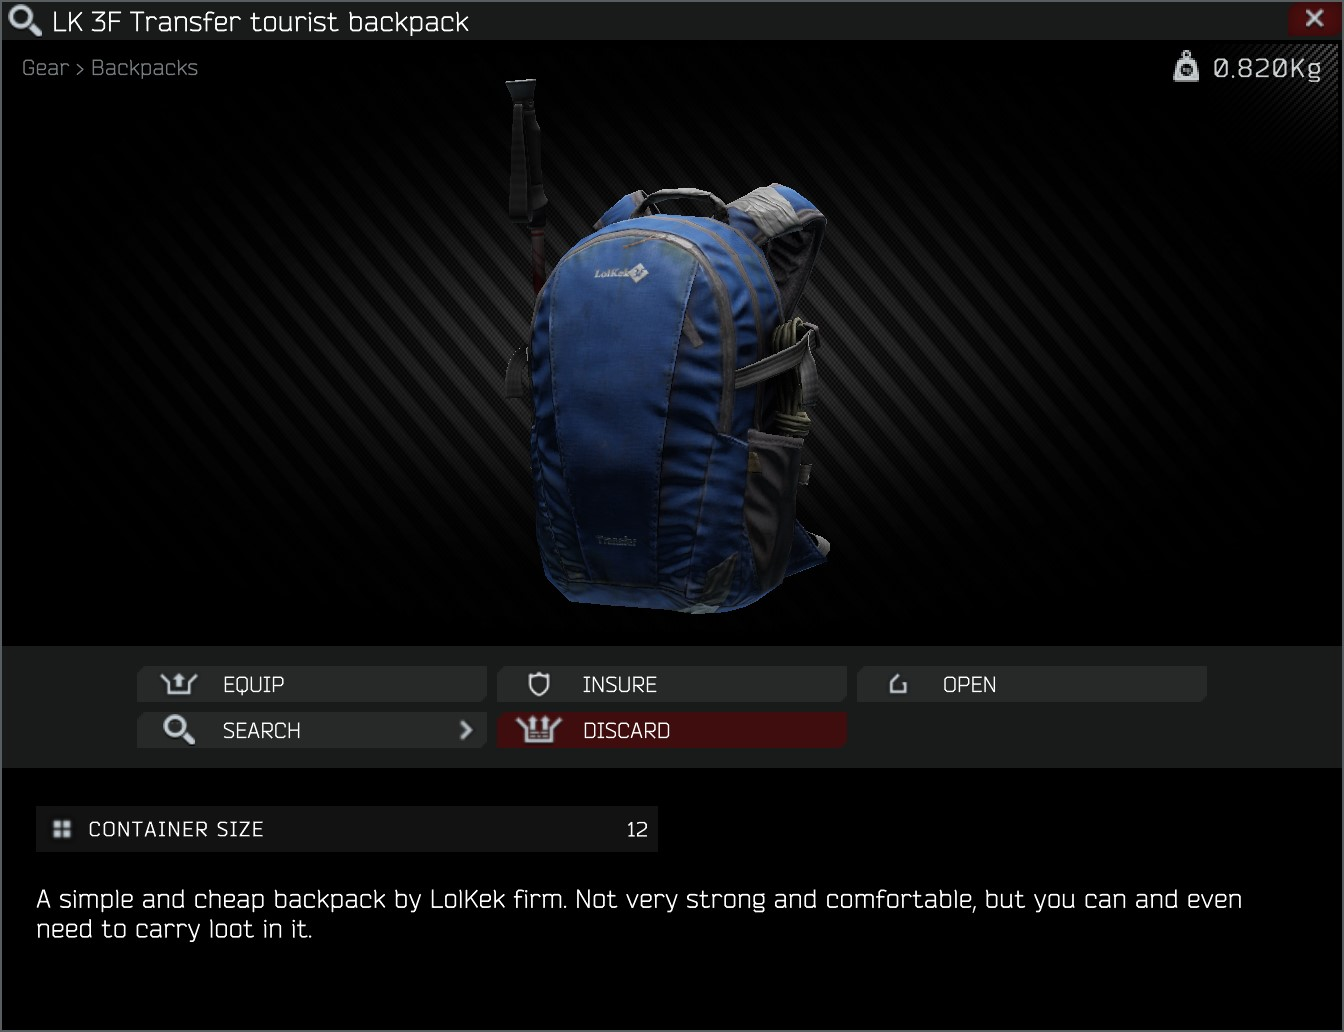 LK 3F backpack.jpg